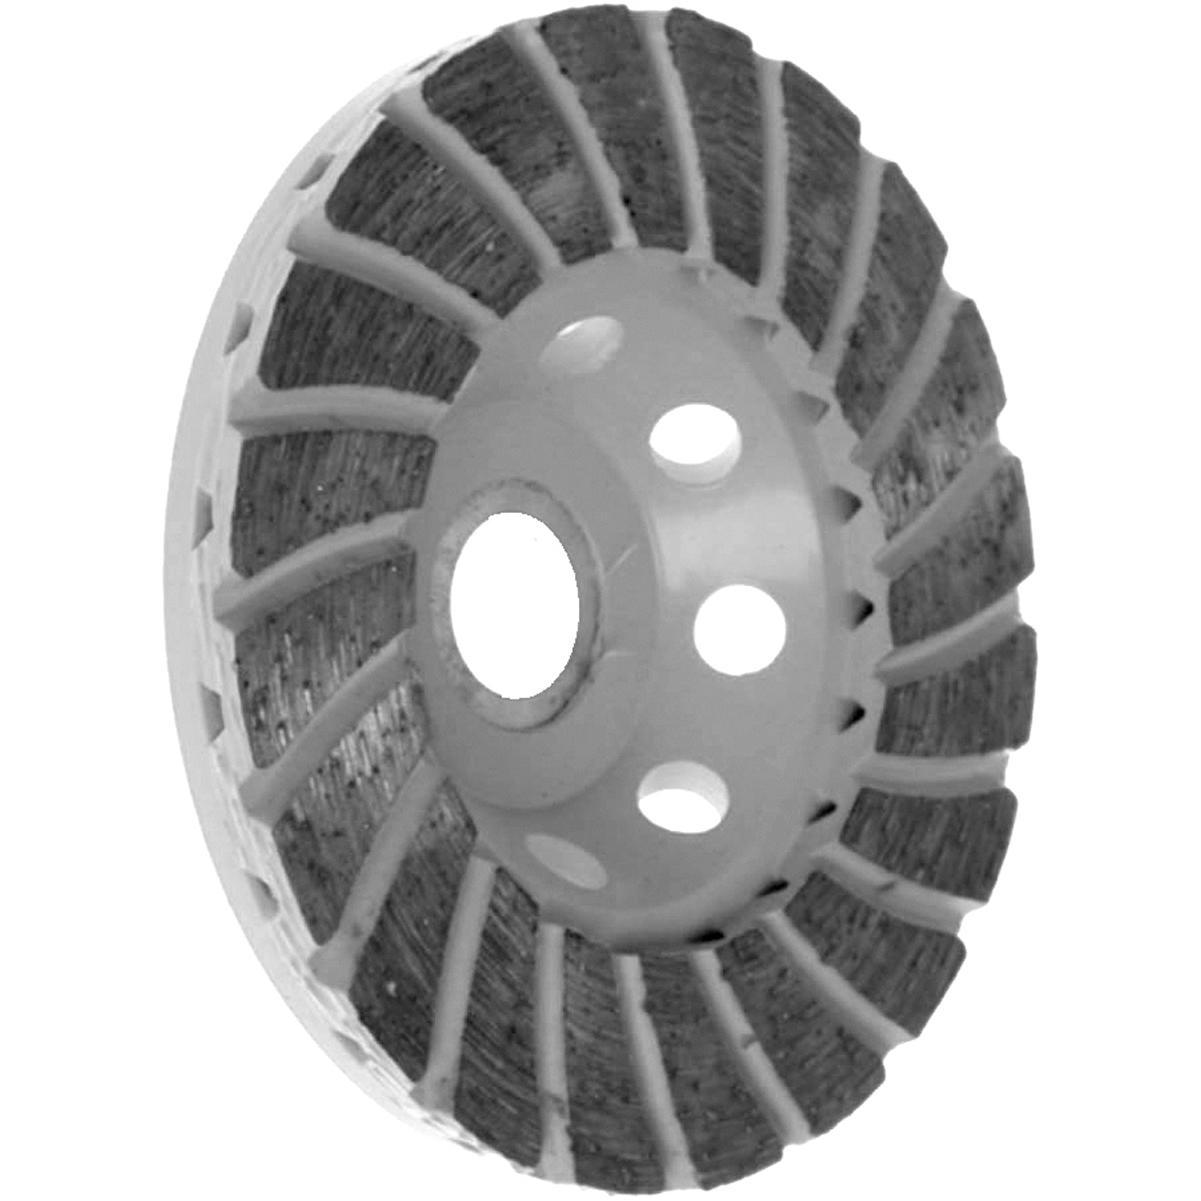 OX Ult 4.5 Turbo Cup Grinder 22.2mm